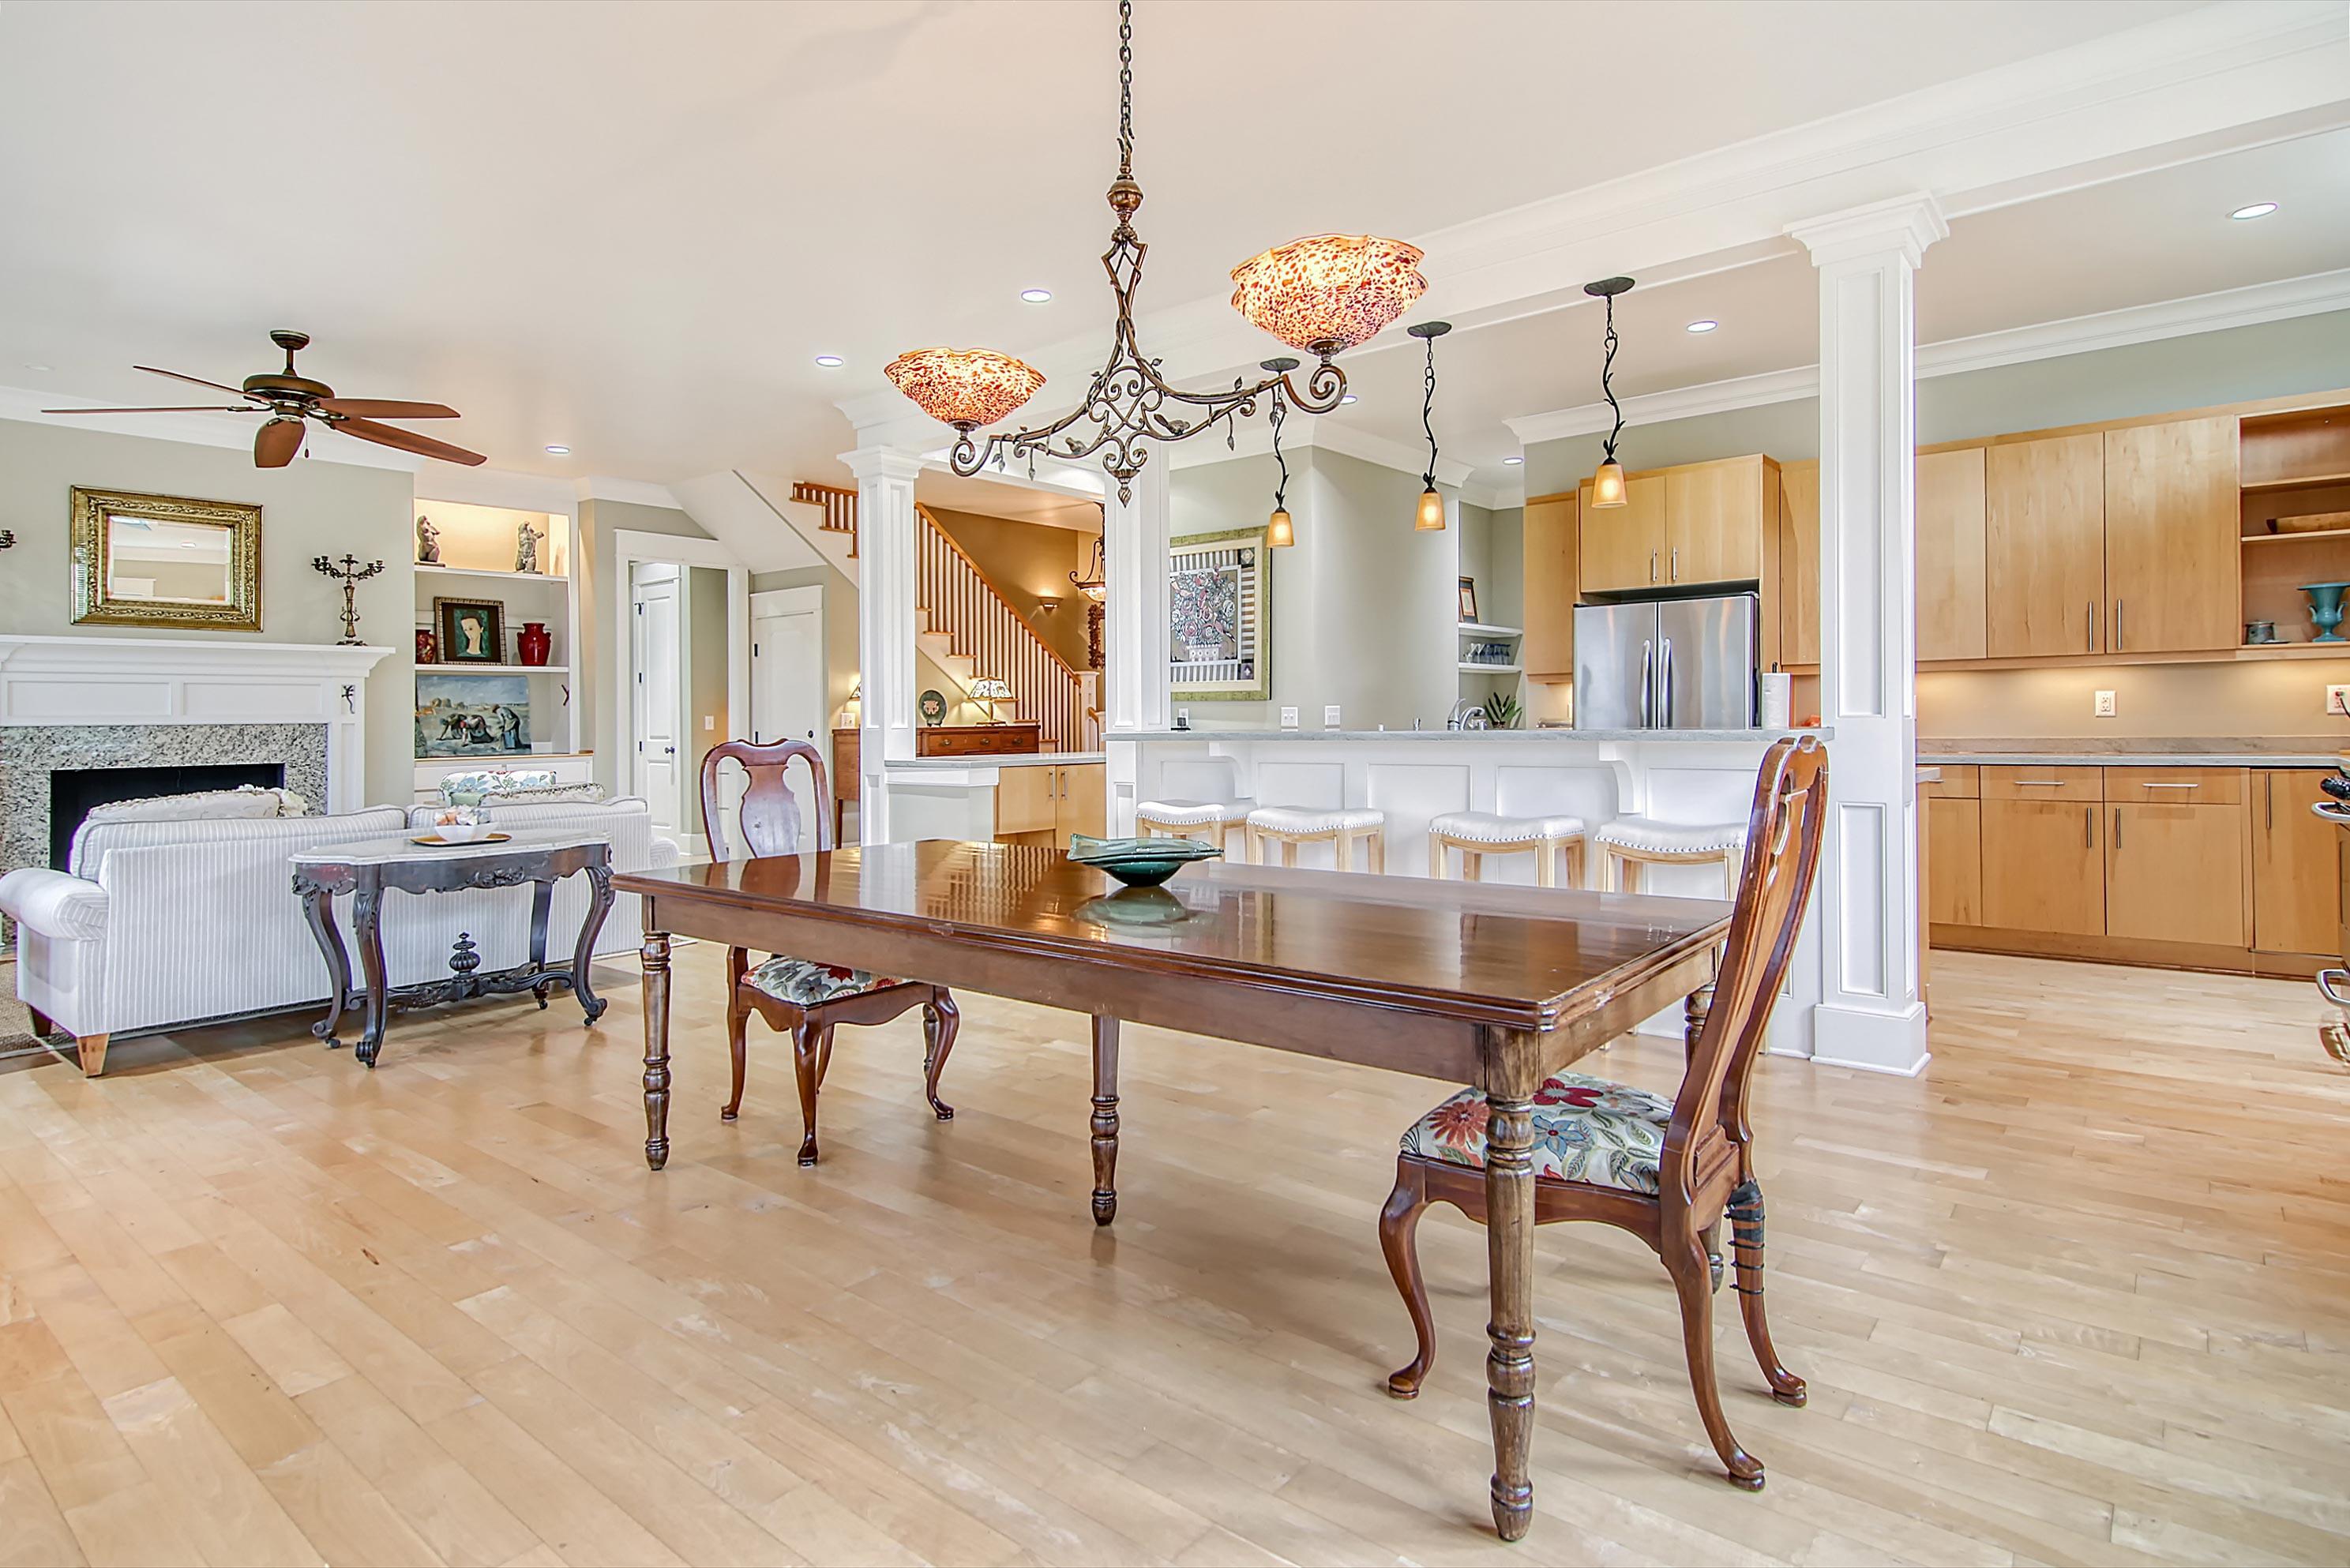 Scanlonville Homes For Sale - 152 6th, Mount Pleasant, SC - 6